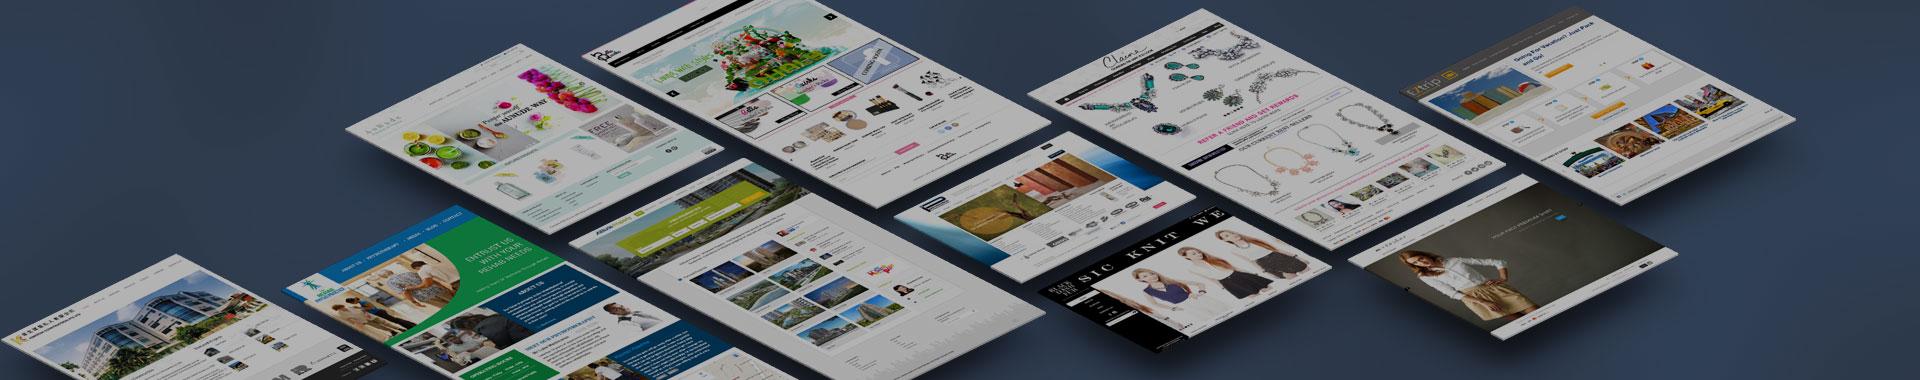 Website Design Singapore - Ricky Comics